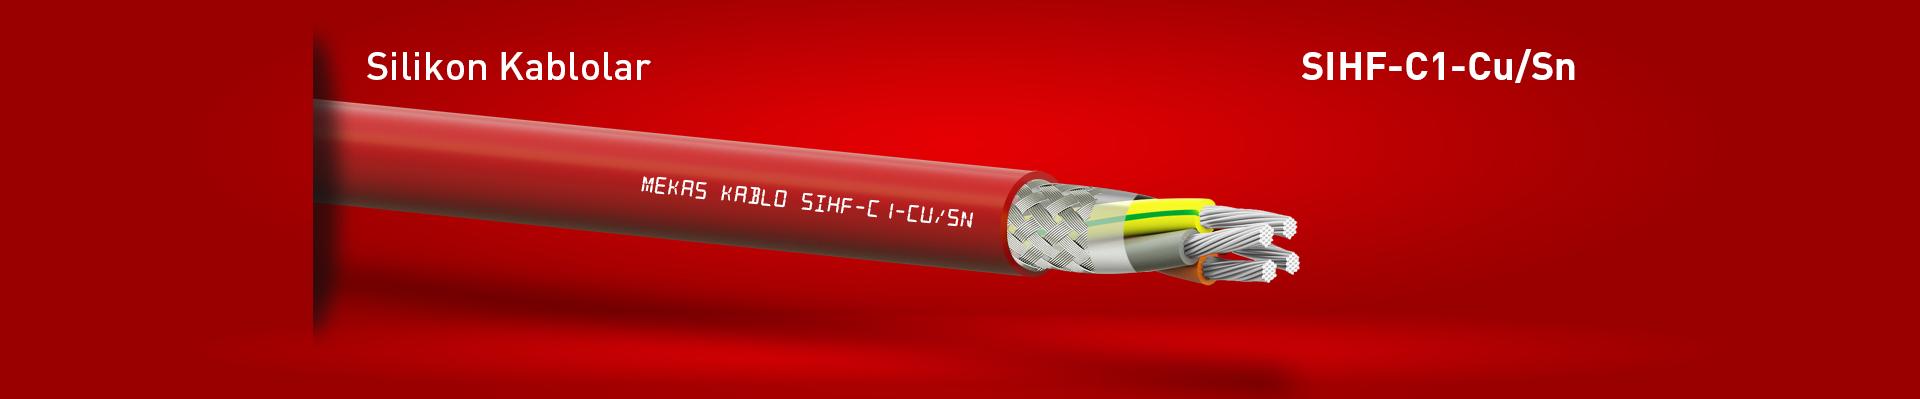 silikon kablo